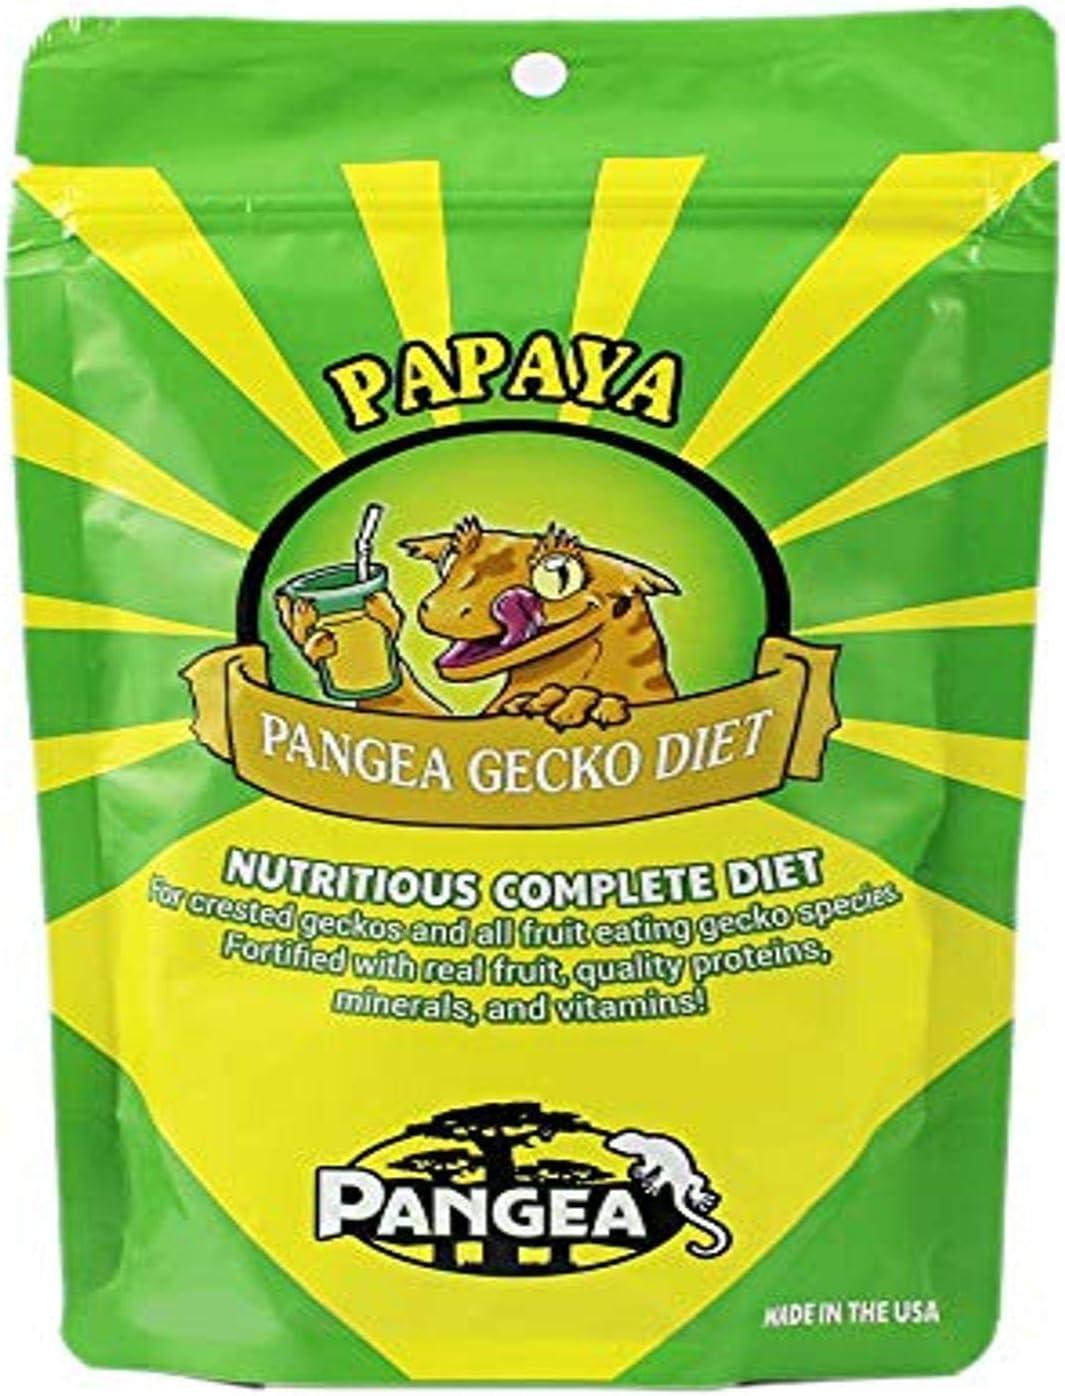 Pangea Papaya Fruit Mix Complete Crested Gecko Food, 2 Oz.